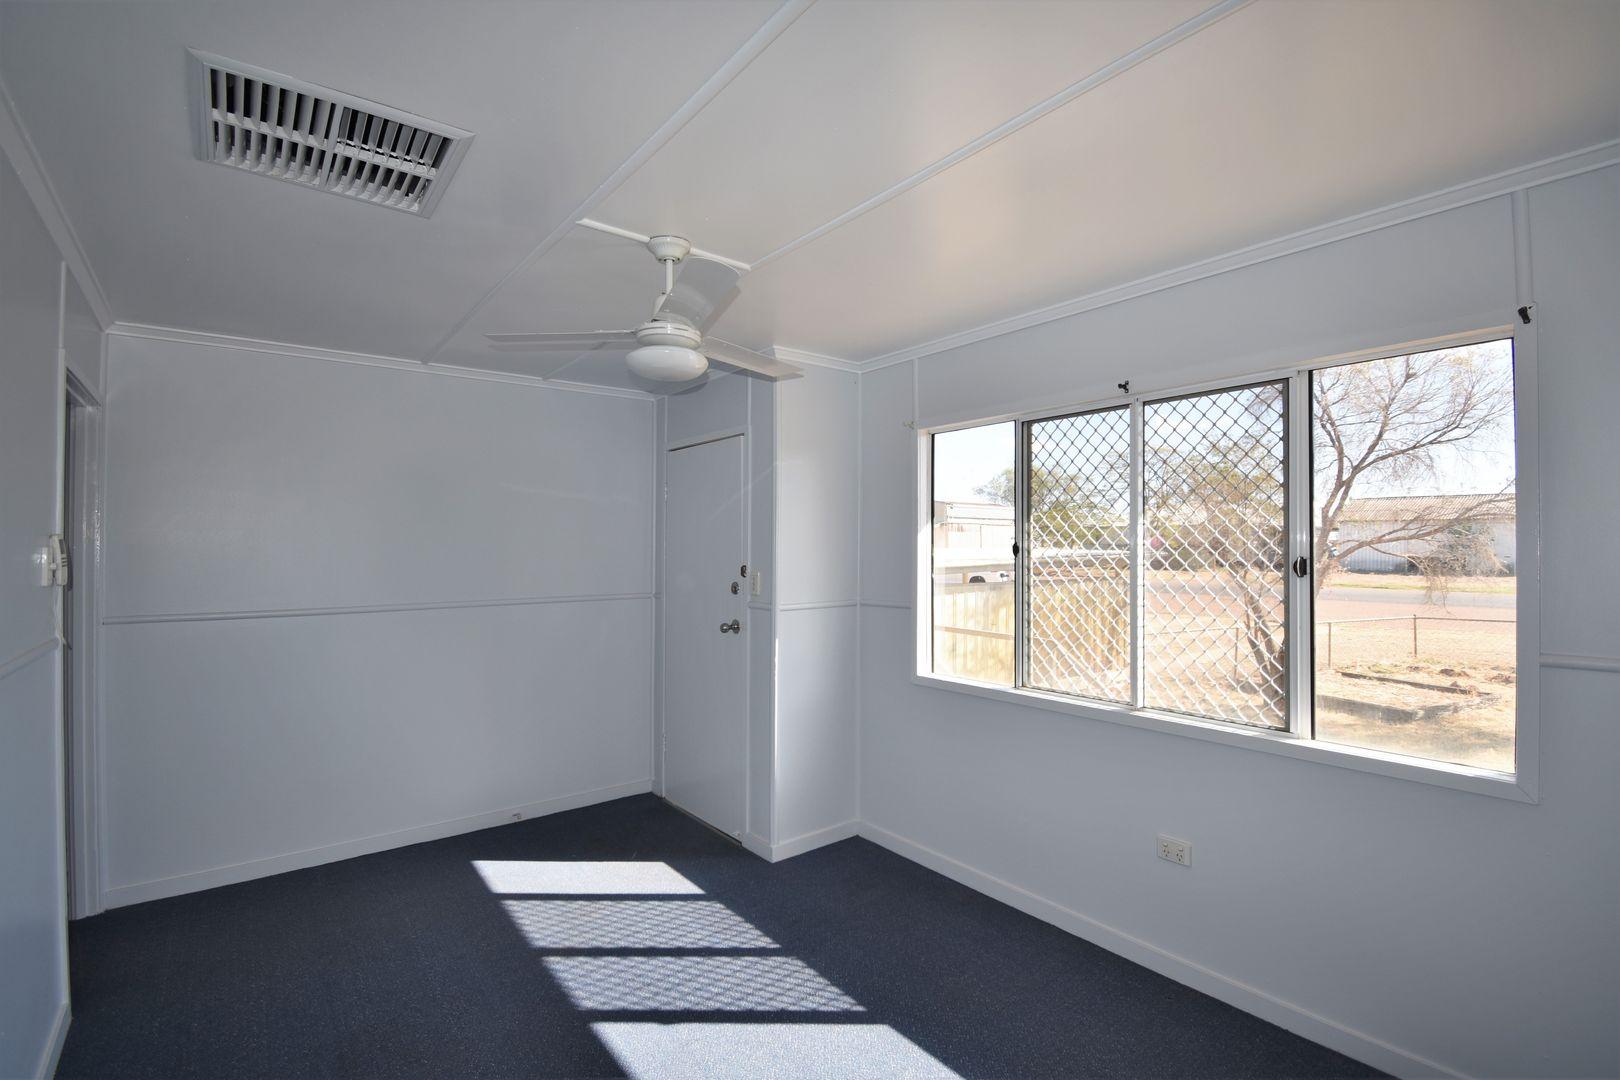 49 Booker Street, Aramac QLD 4726, Image 1